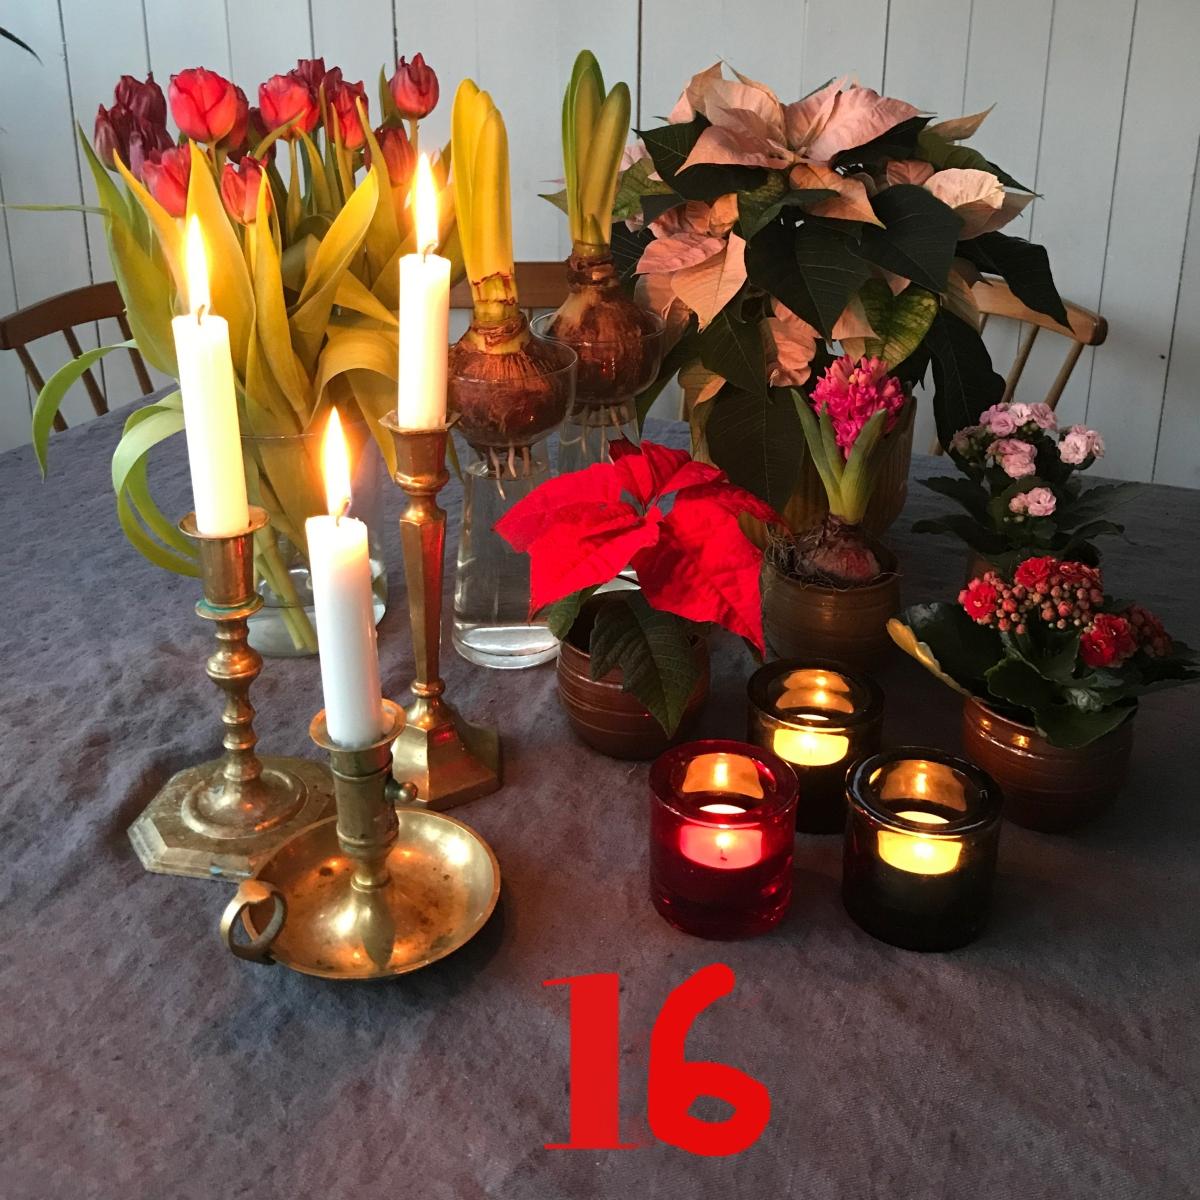 Ljuskalender 16